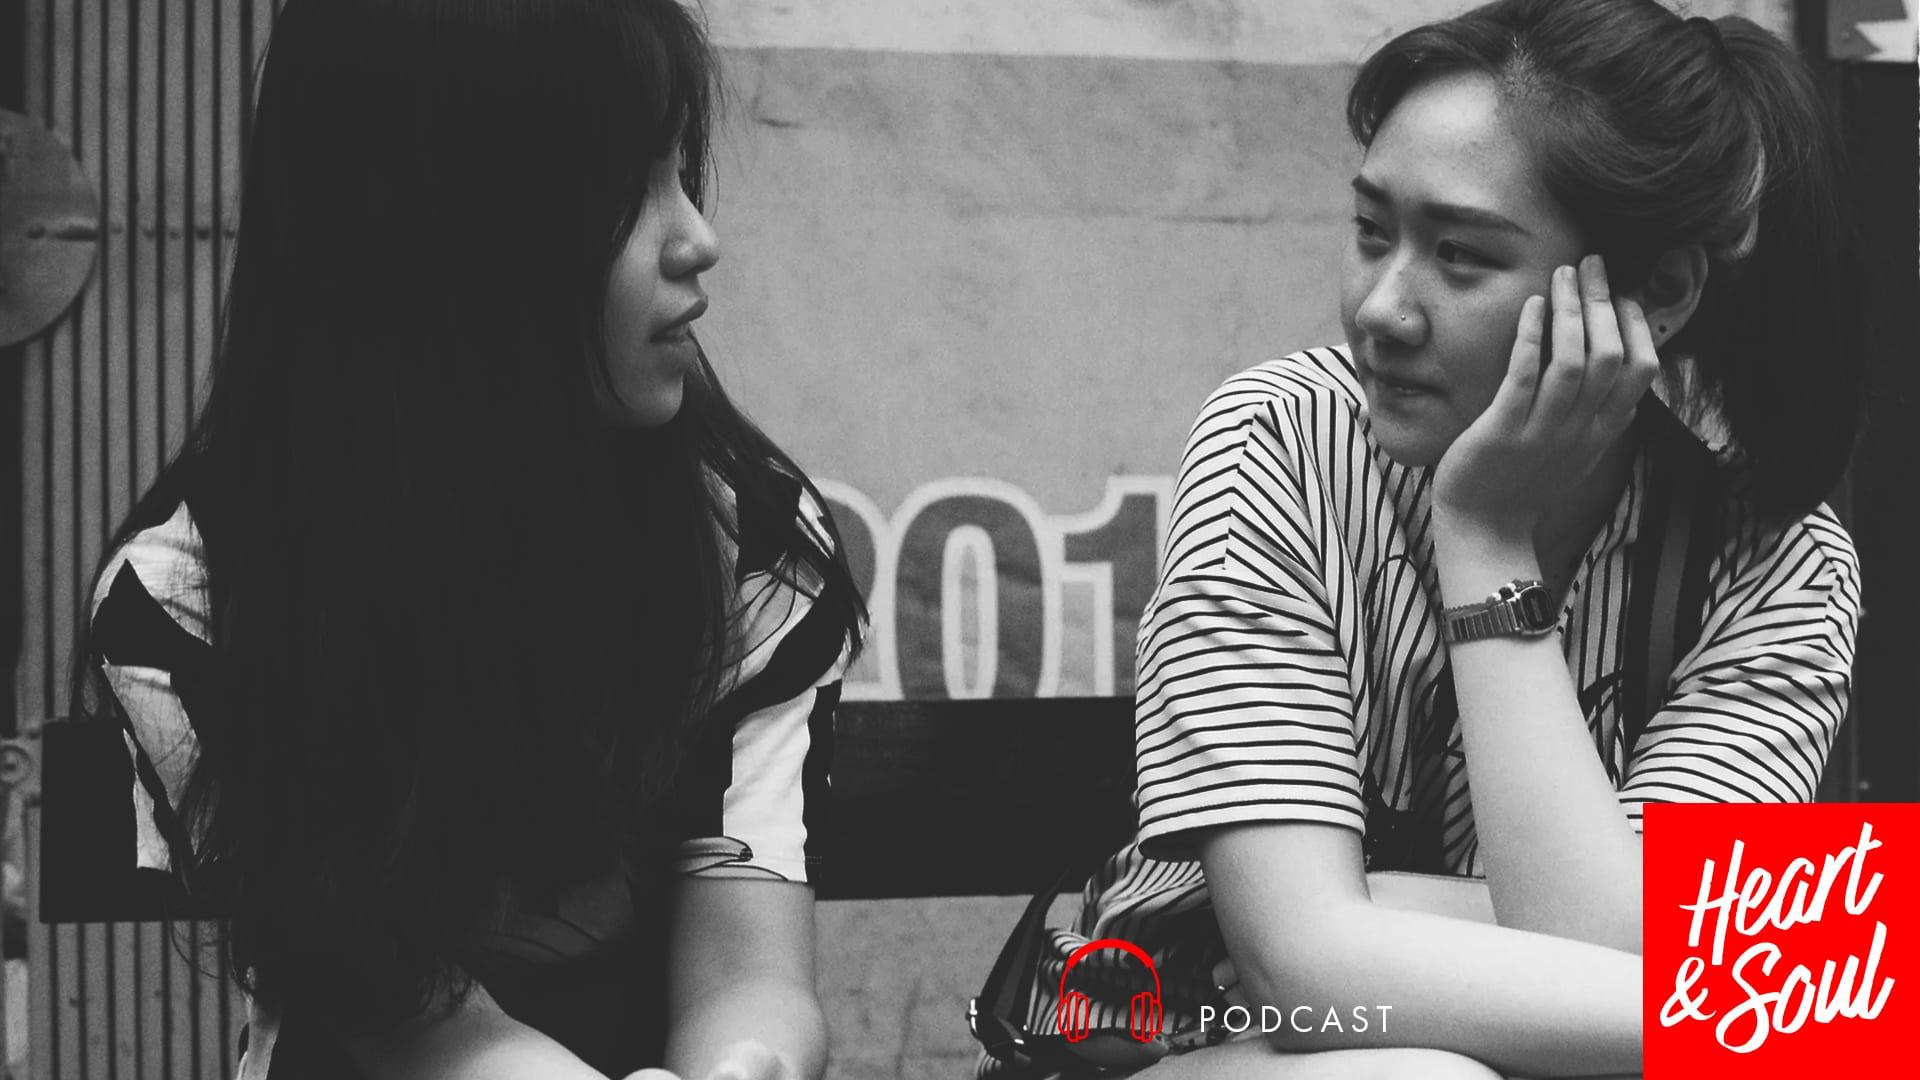 Two asian women in conversation